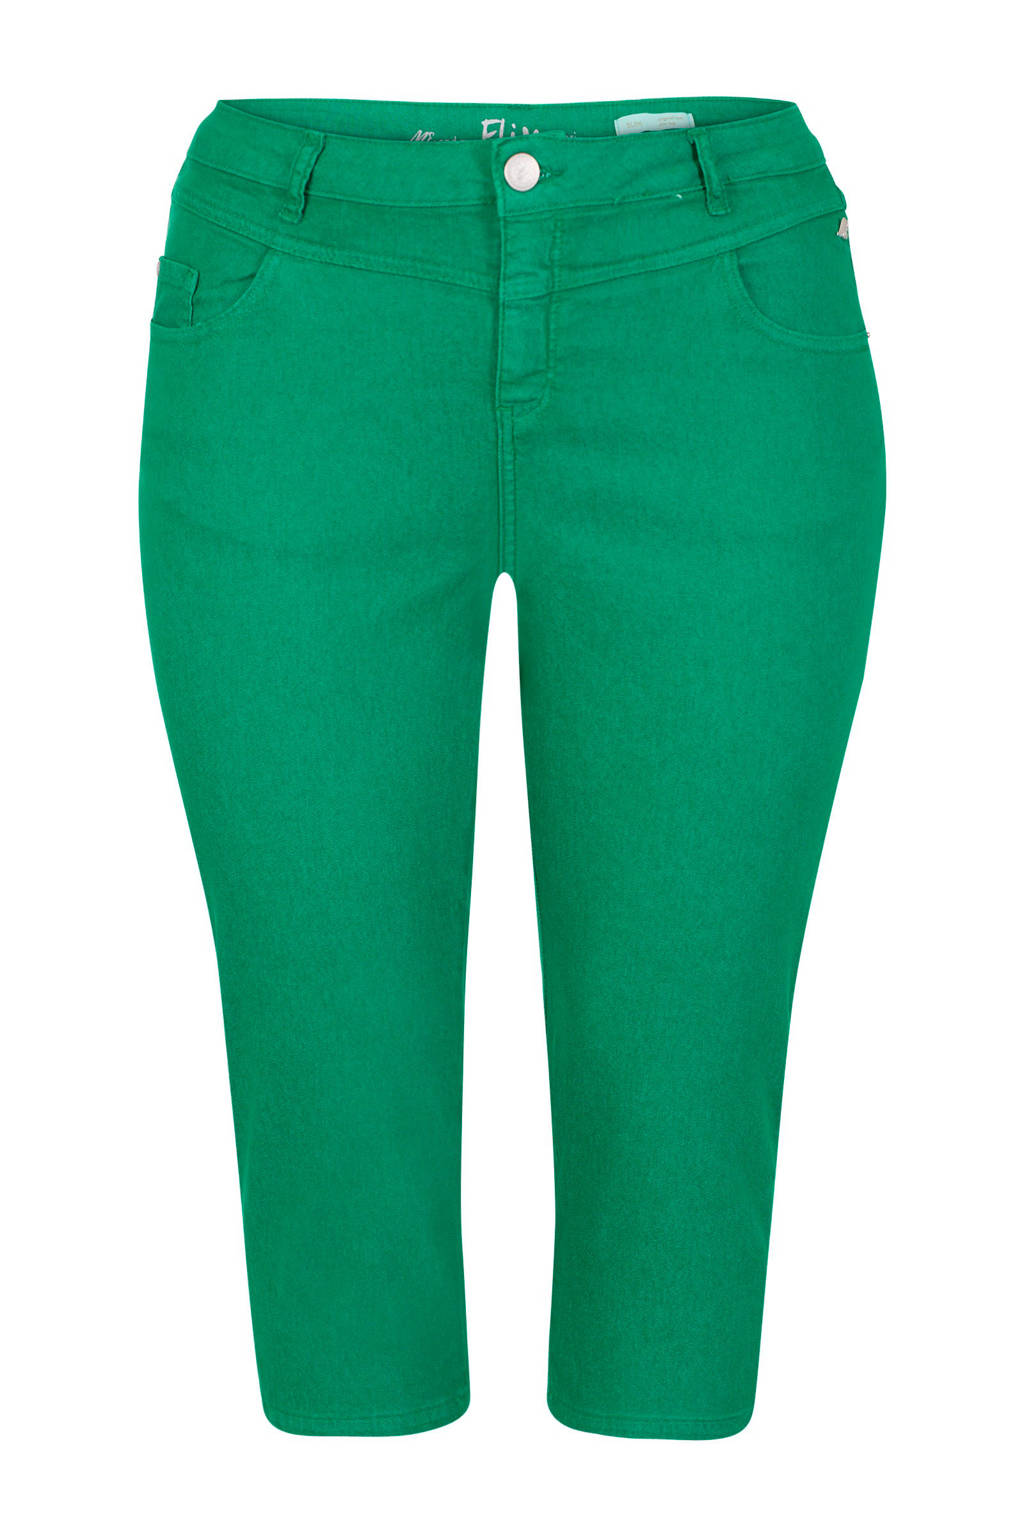 Miss Etam Plus slim fit capri groen, Groen